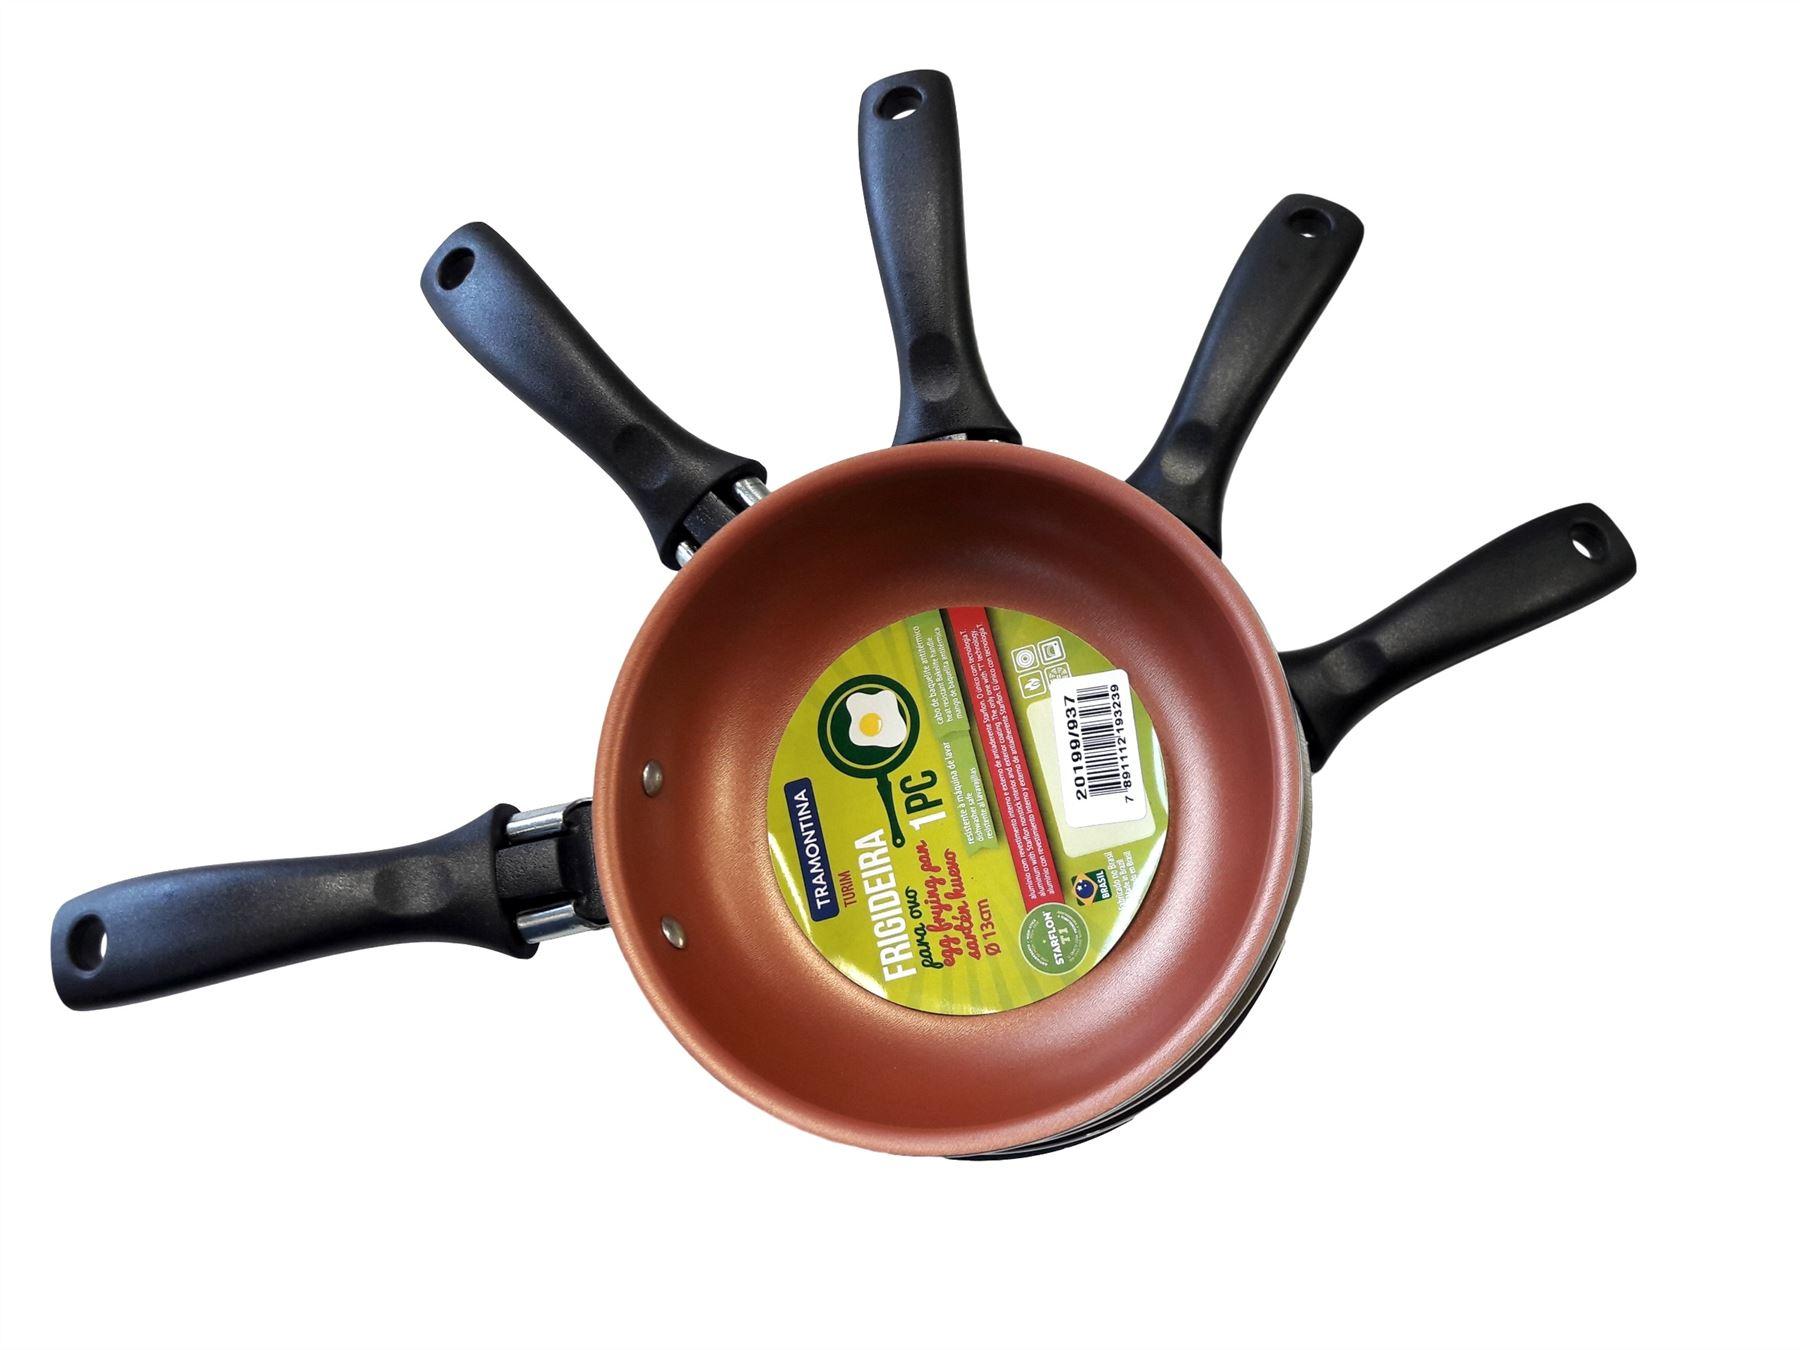 Tramontina Small Blini Deep Frying Frypan Pan 13cm dia Metallic Copper Gold Blue